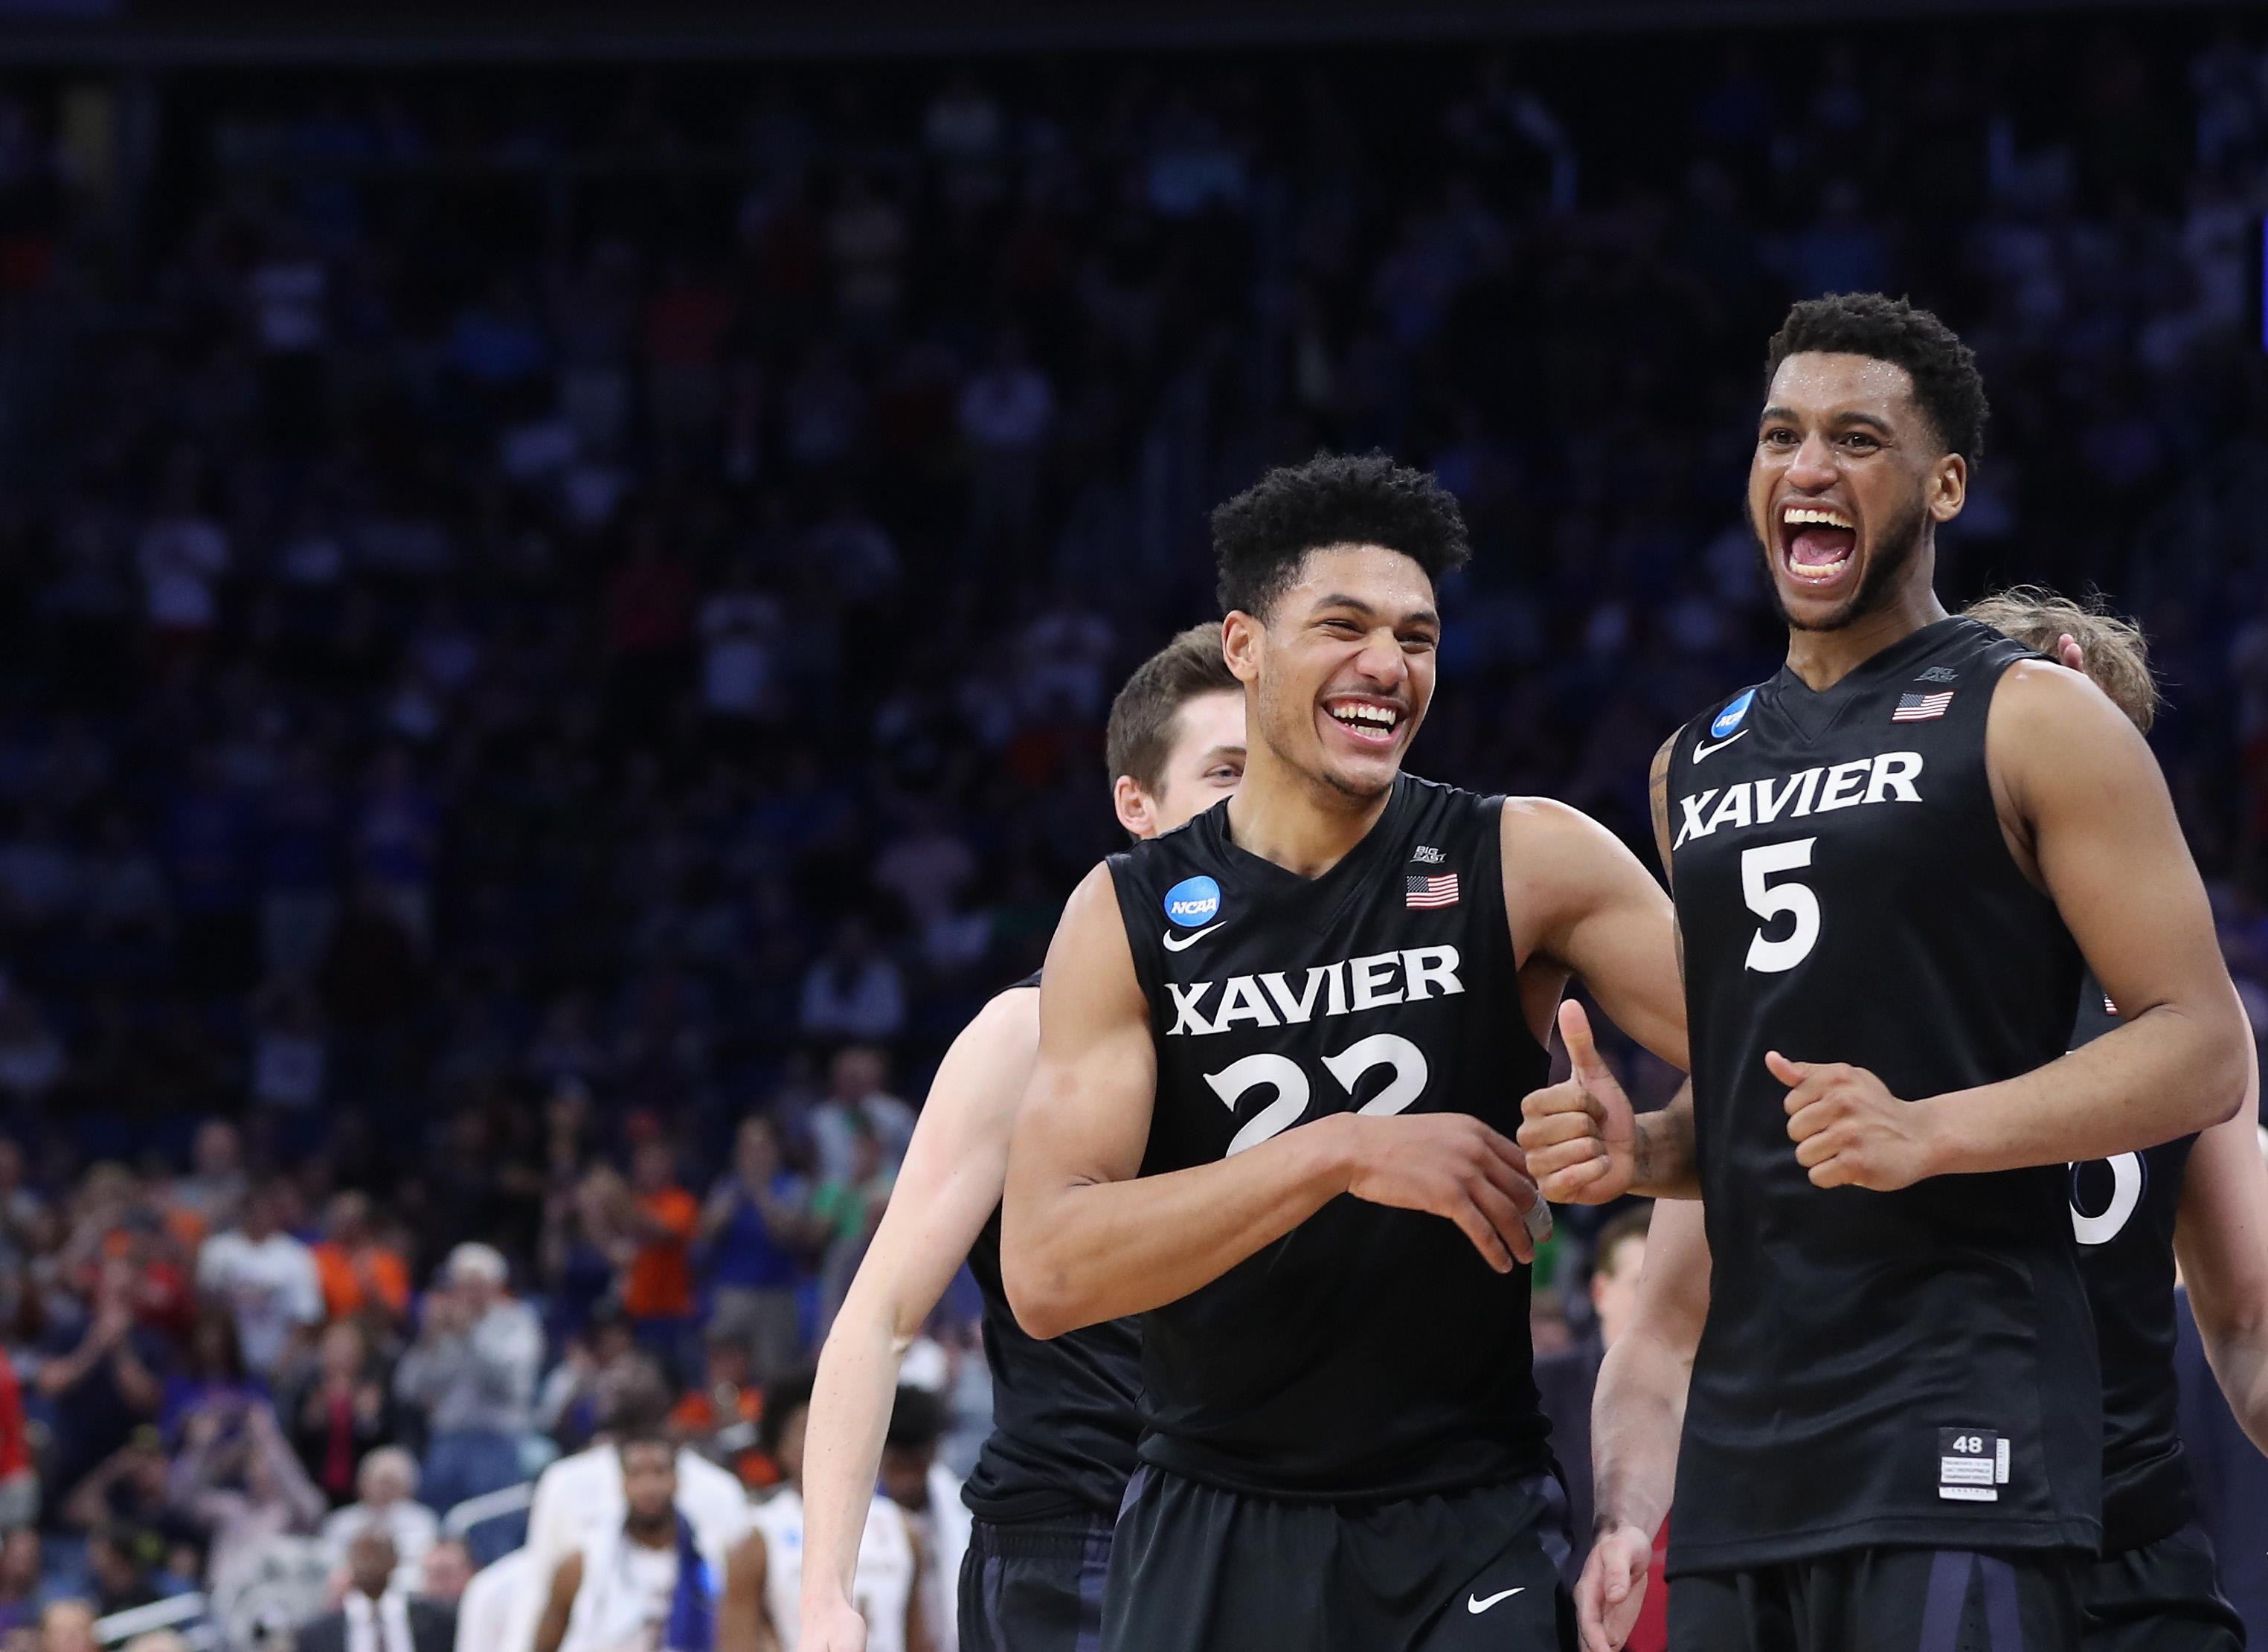 NCAA Basketball Tournament - Second Round - Xavier v Florida State